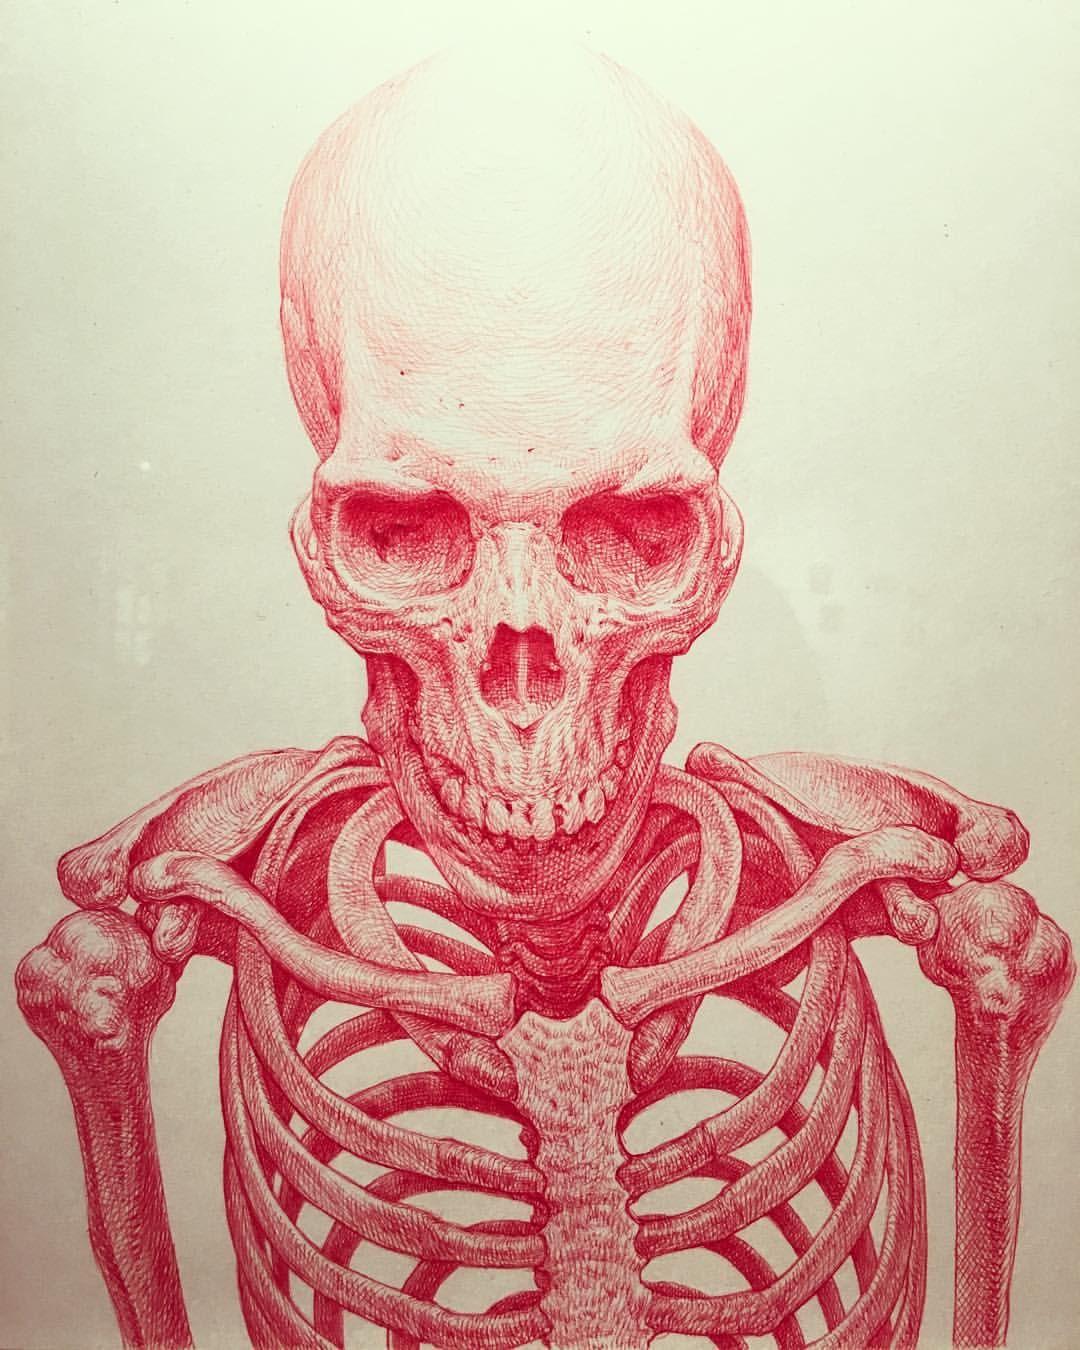 одном картинки с скелетиком фото